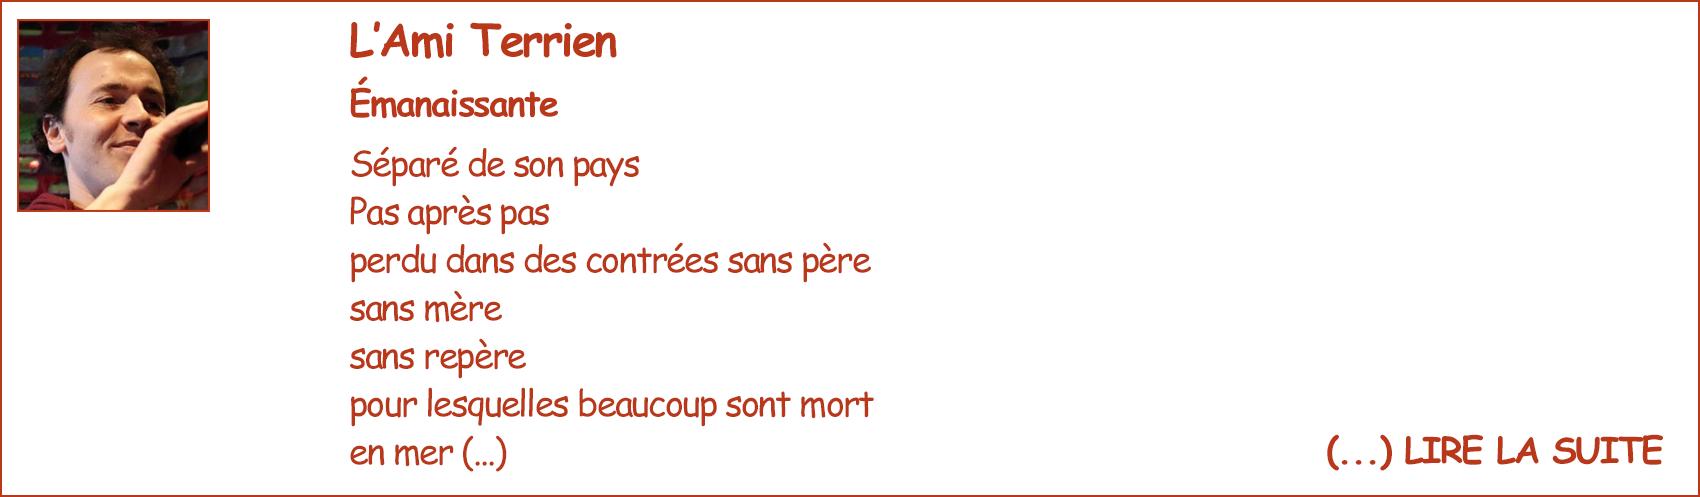 http://slamerie.l.s.f.unblog.fr/files/2021/03/texte-ami-terrien-mars-2021-01.png